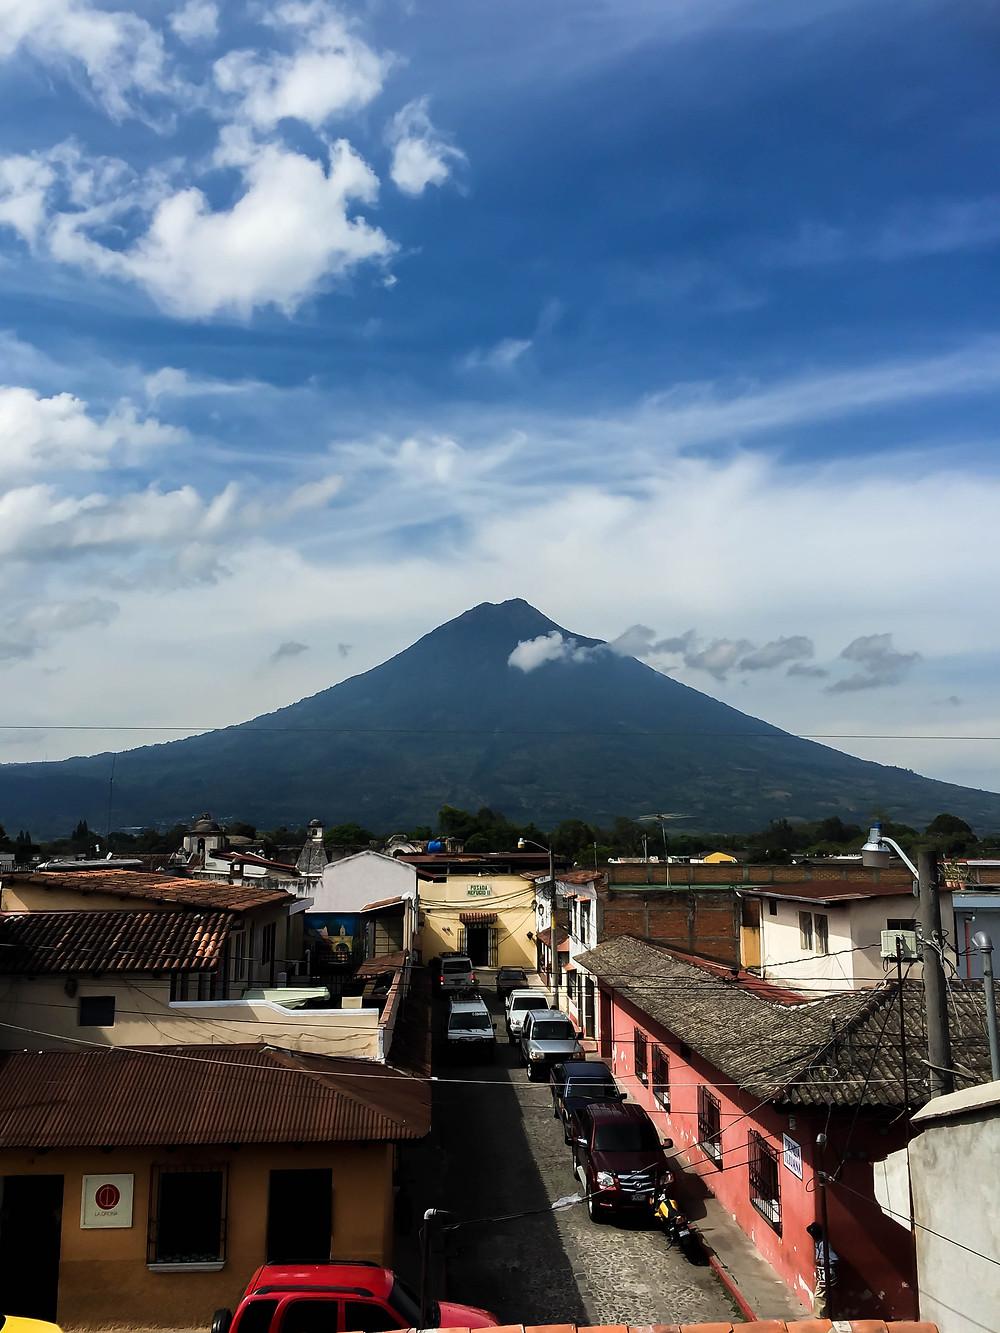 Volcan de Agua, Antigua de Guatemala